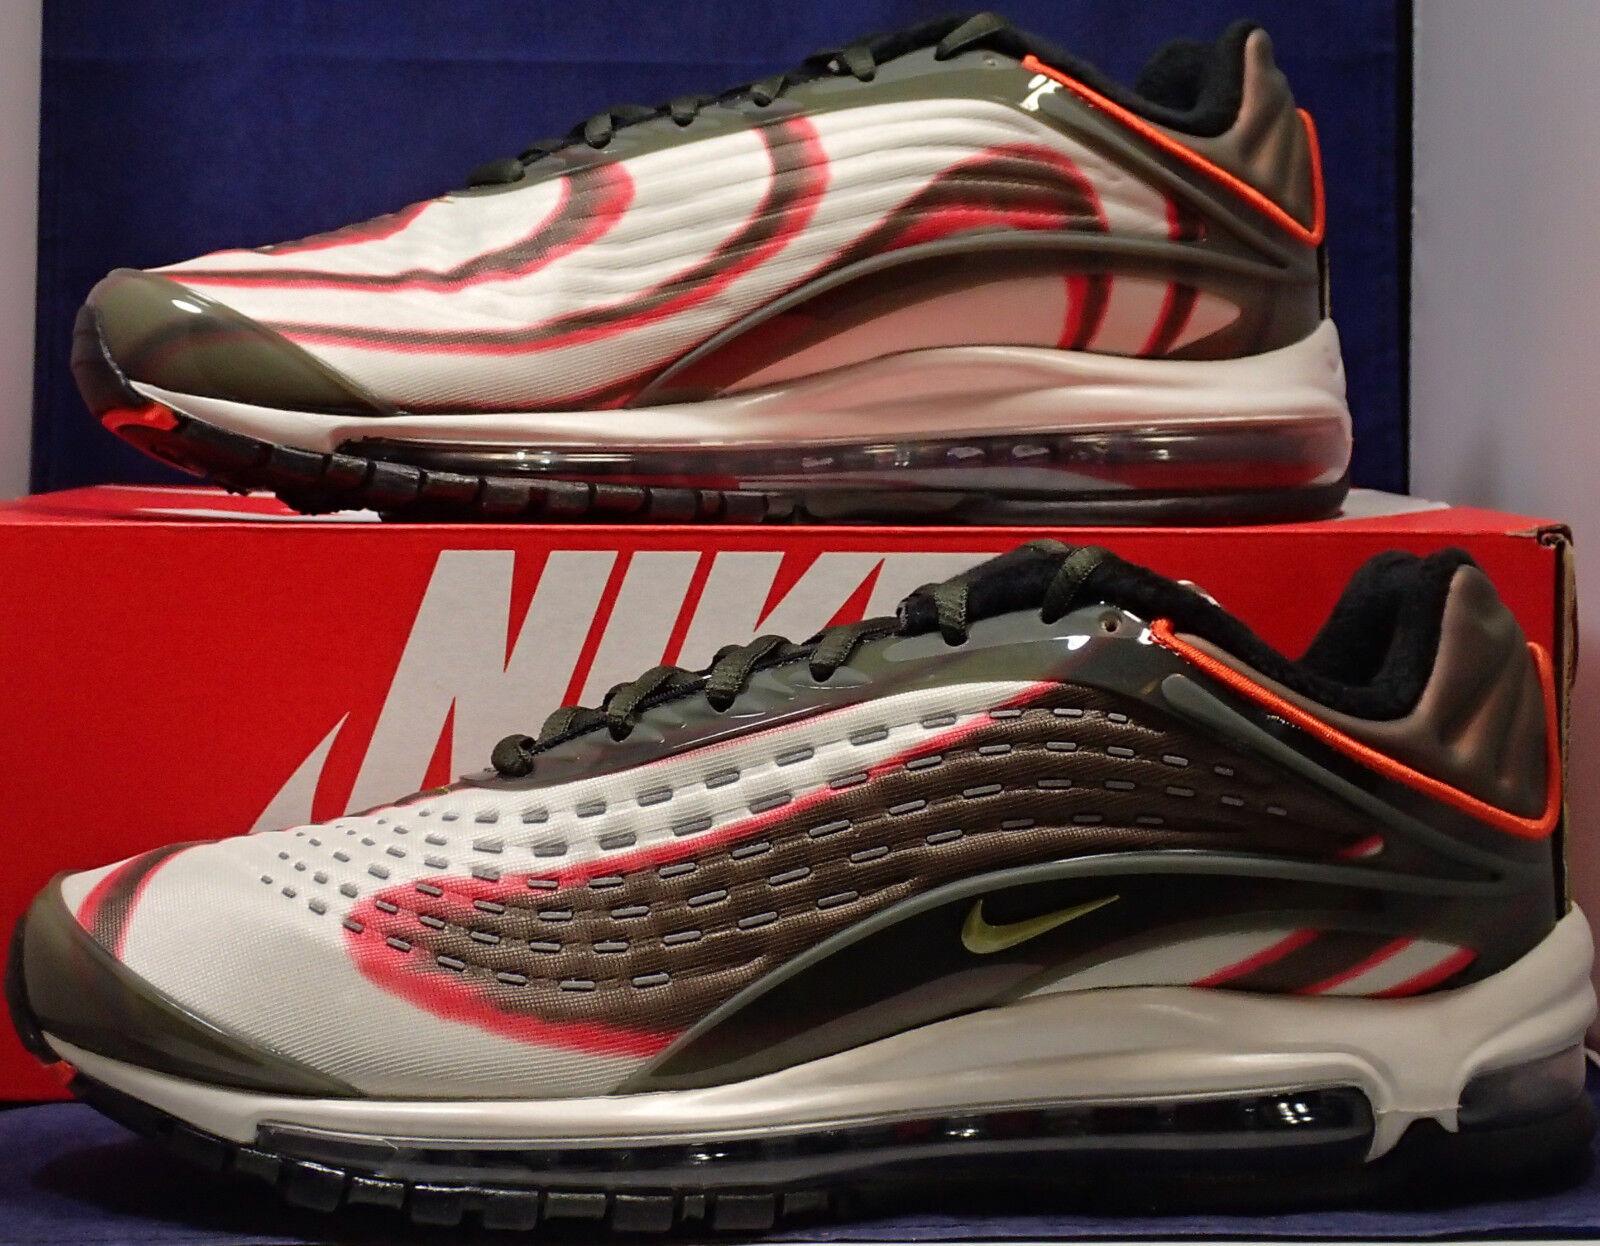 los angeles 9f3ac 51ec2 Nike Air Deluxe Sequoia Green 97 SZ 8.5 ( AJ7831-300 ) Camper Max ...